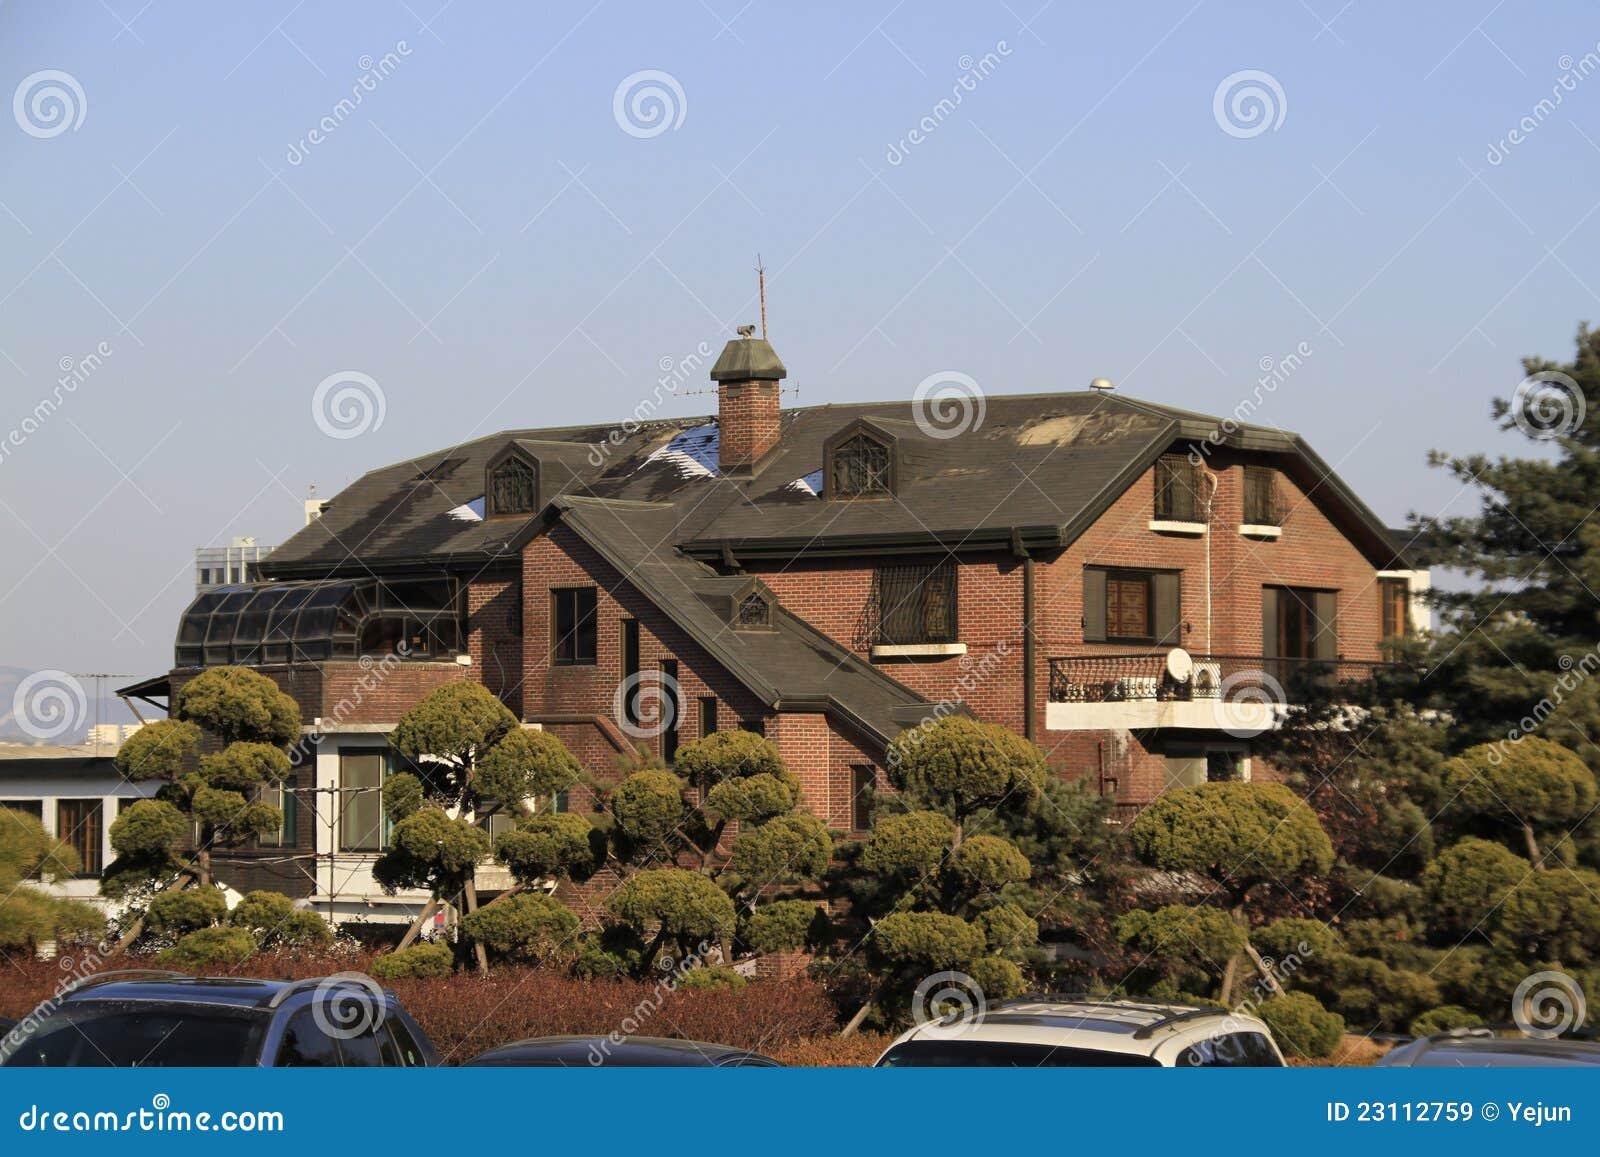 Historic Korean House Stock Image Image Of Architecture 23112759